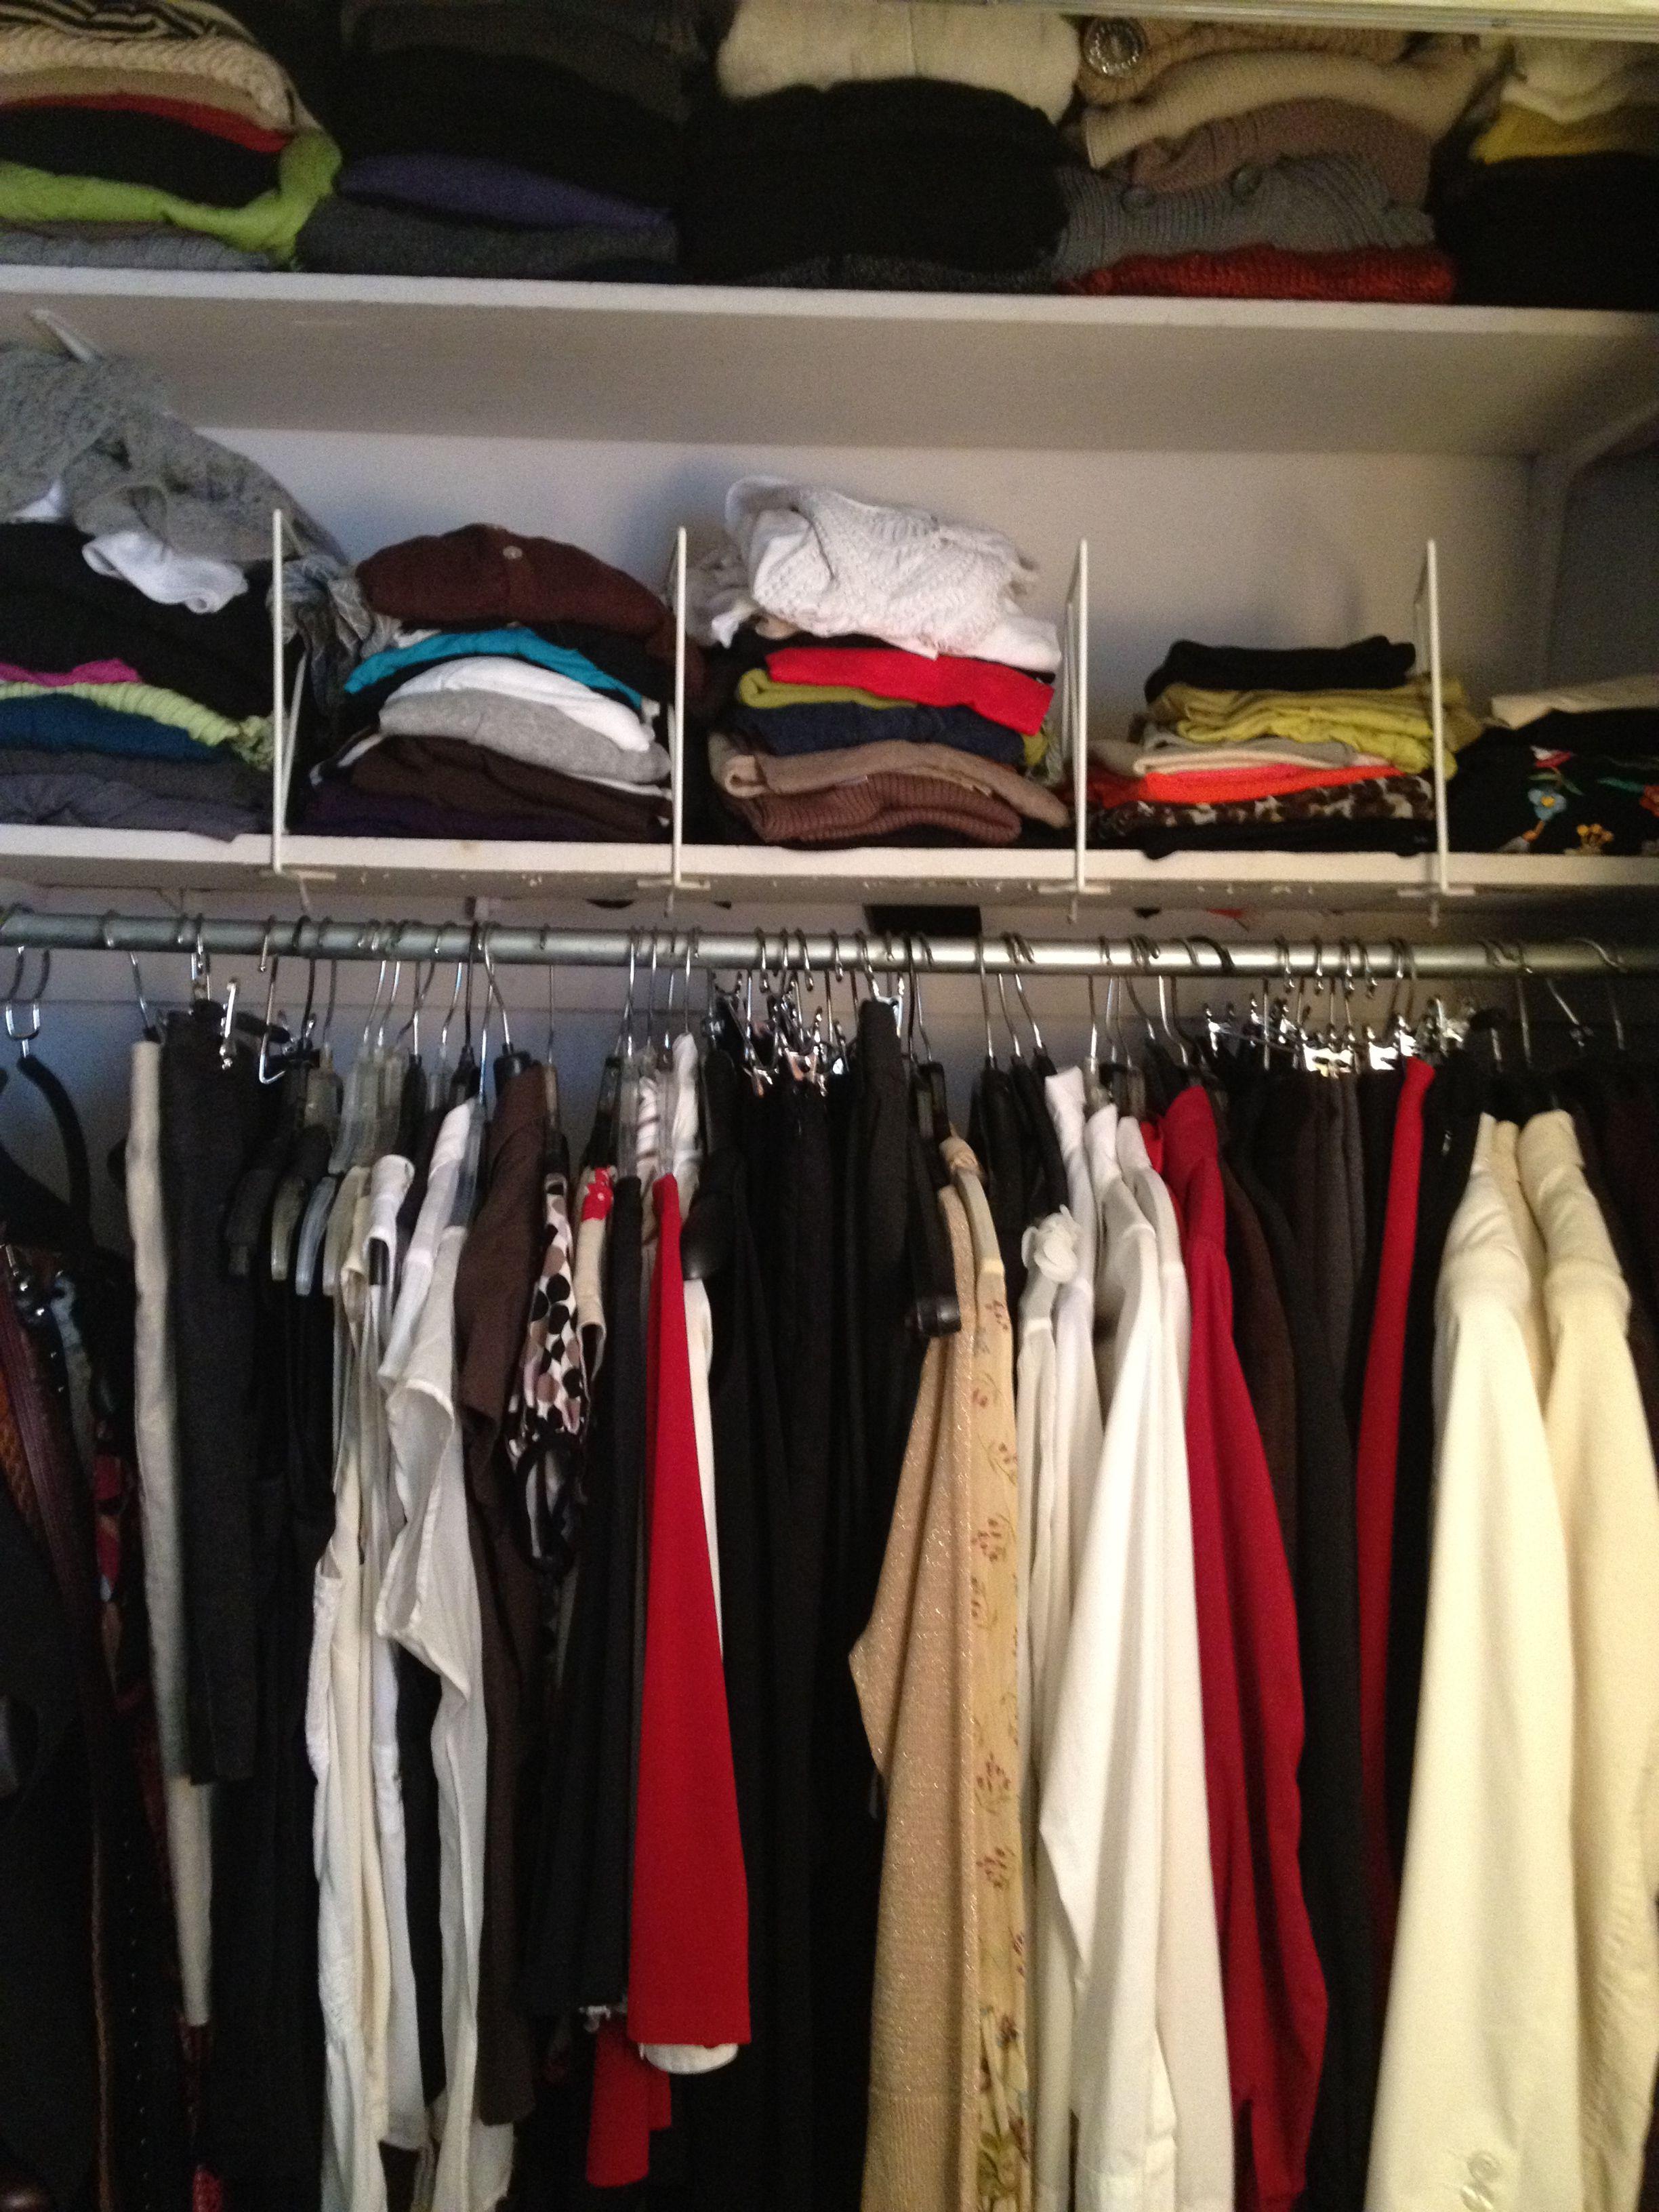 An Organized Closet Can Make You Feel Like A Million Bucks